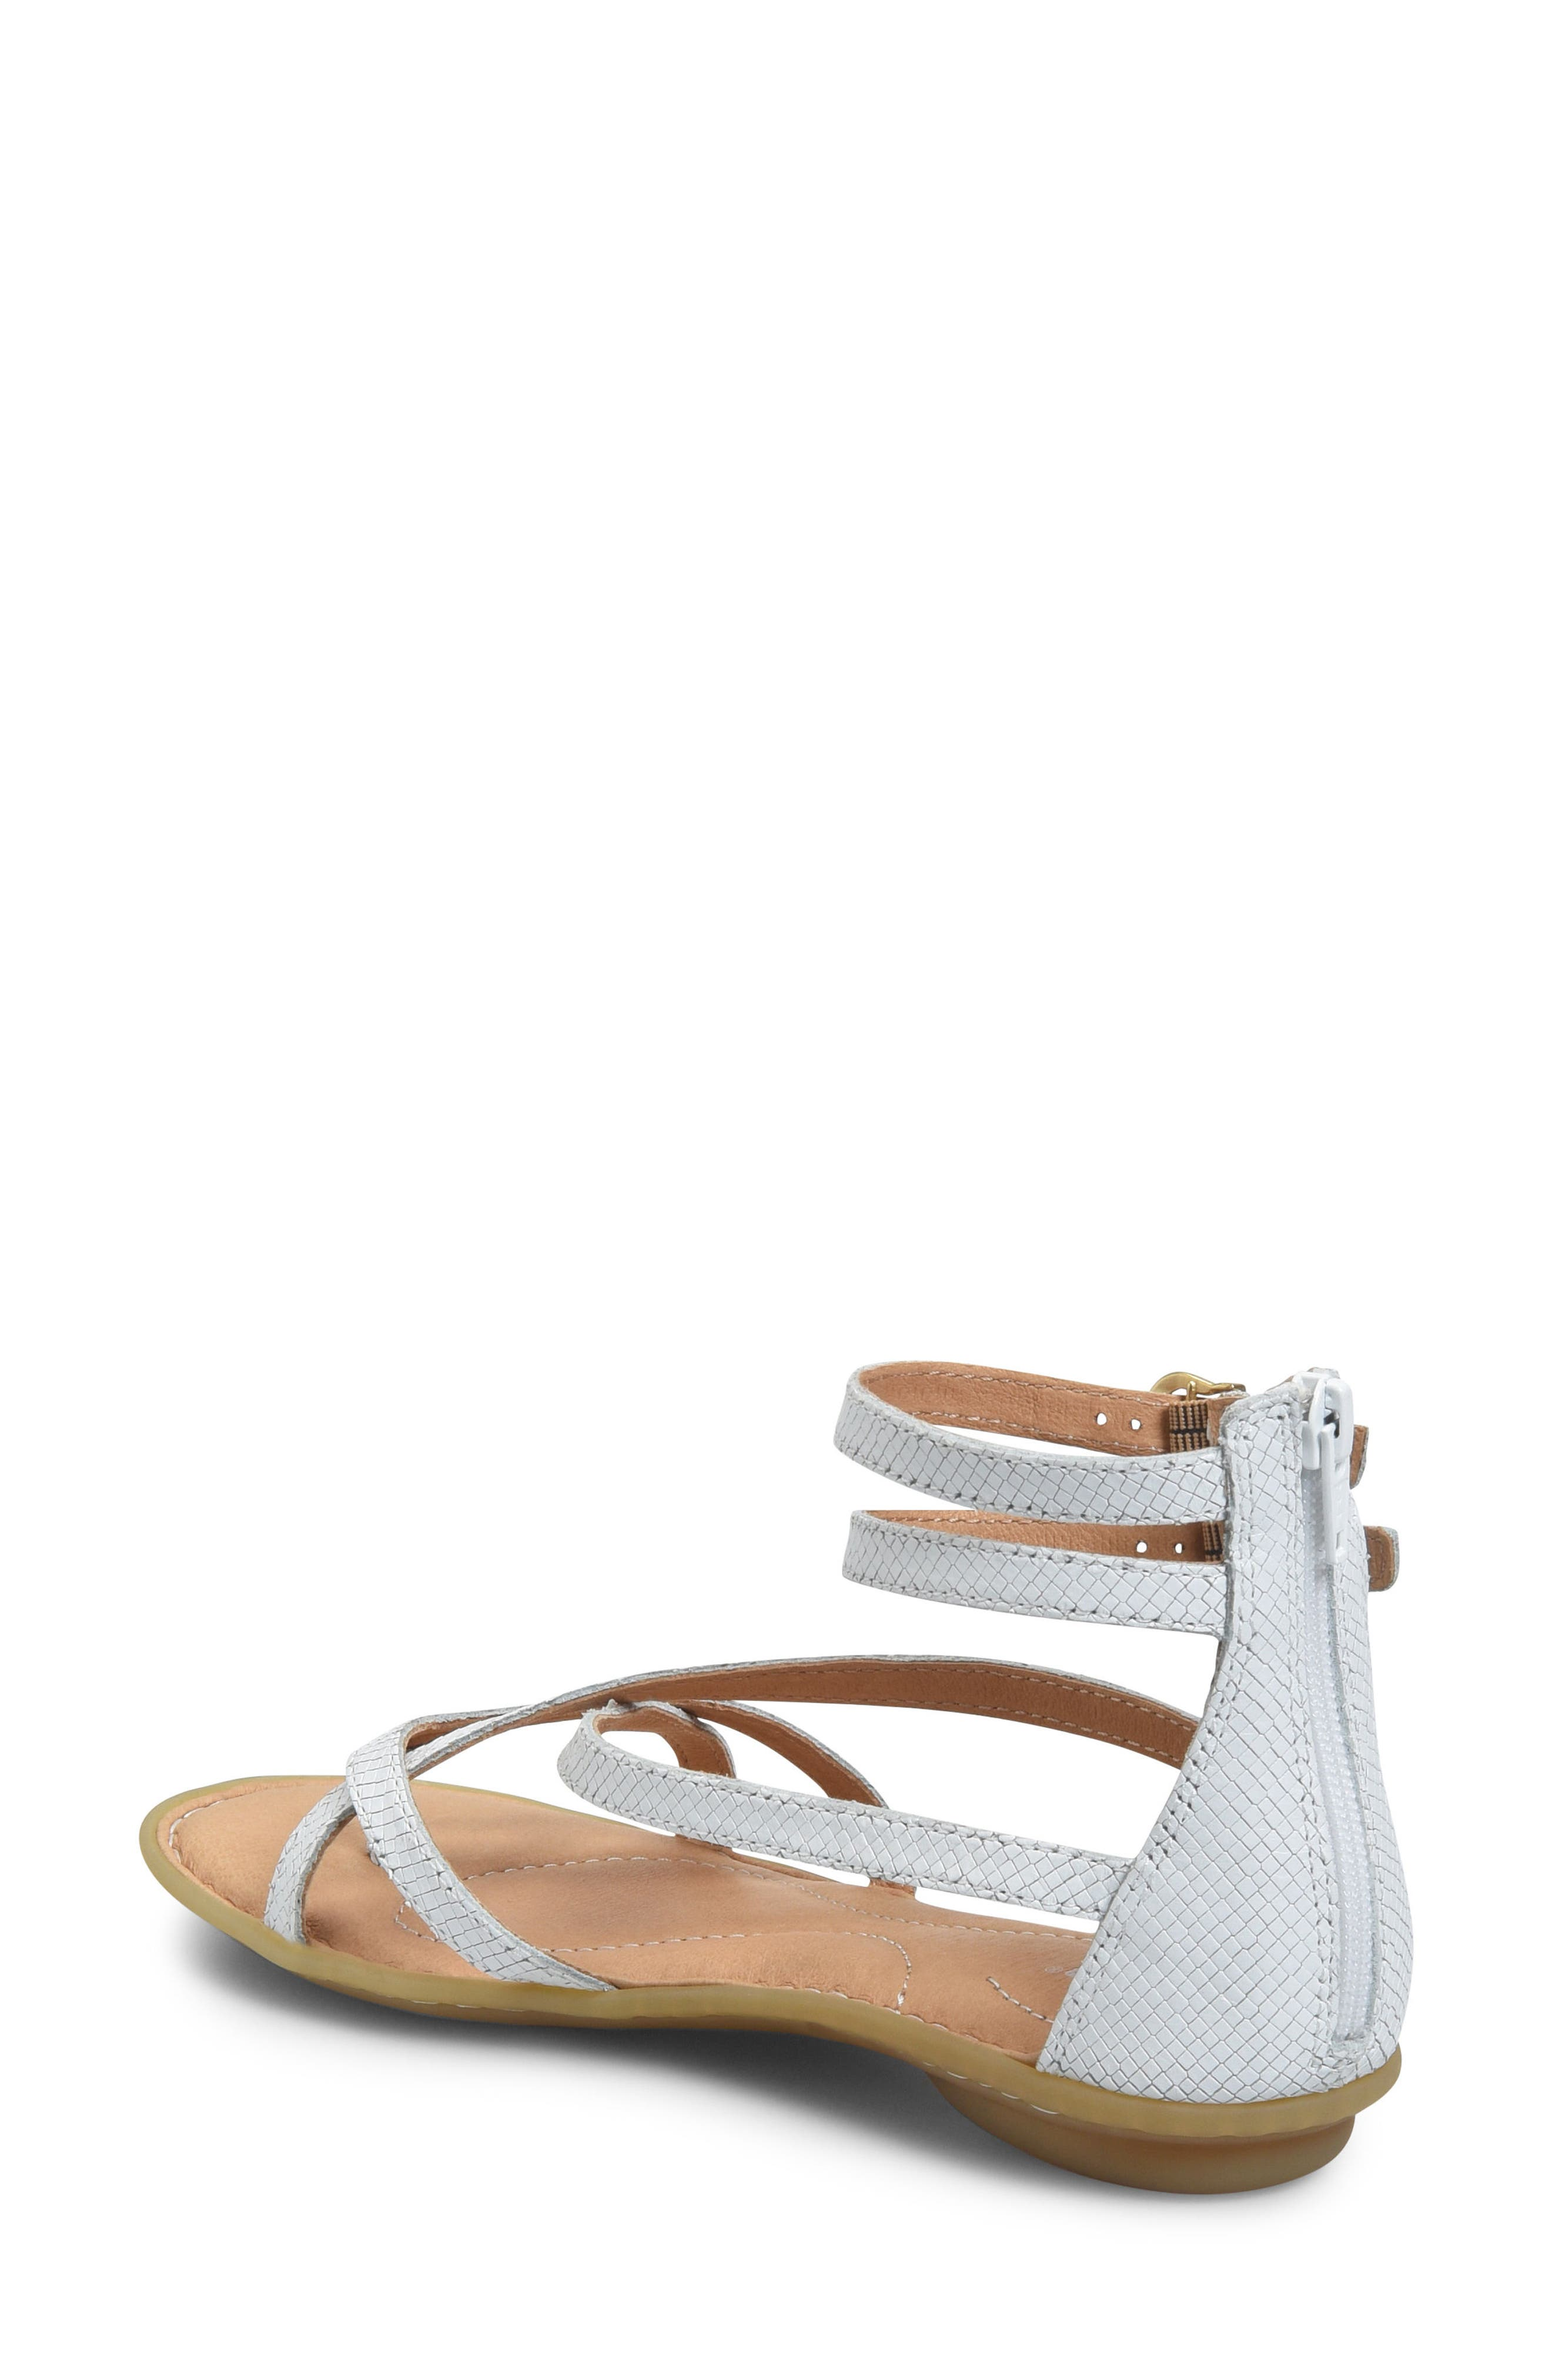 Mai Gladiator Sandal,                             Alternate thumbnail 2, color,                             White Leather